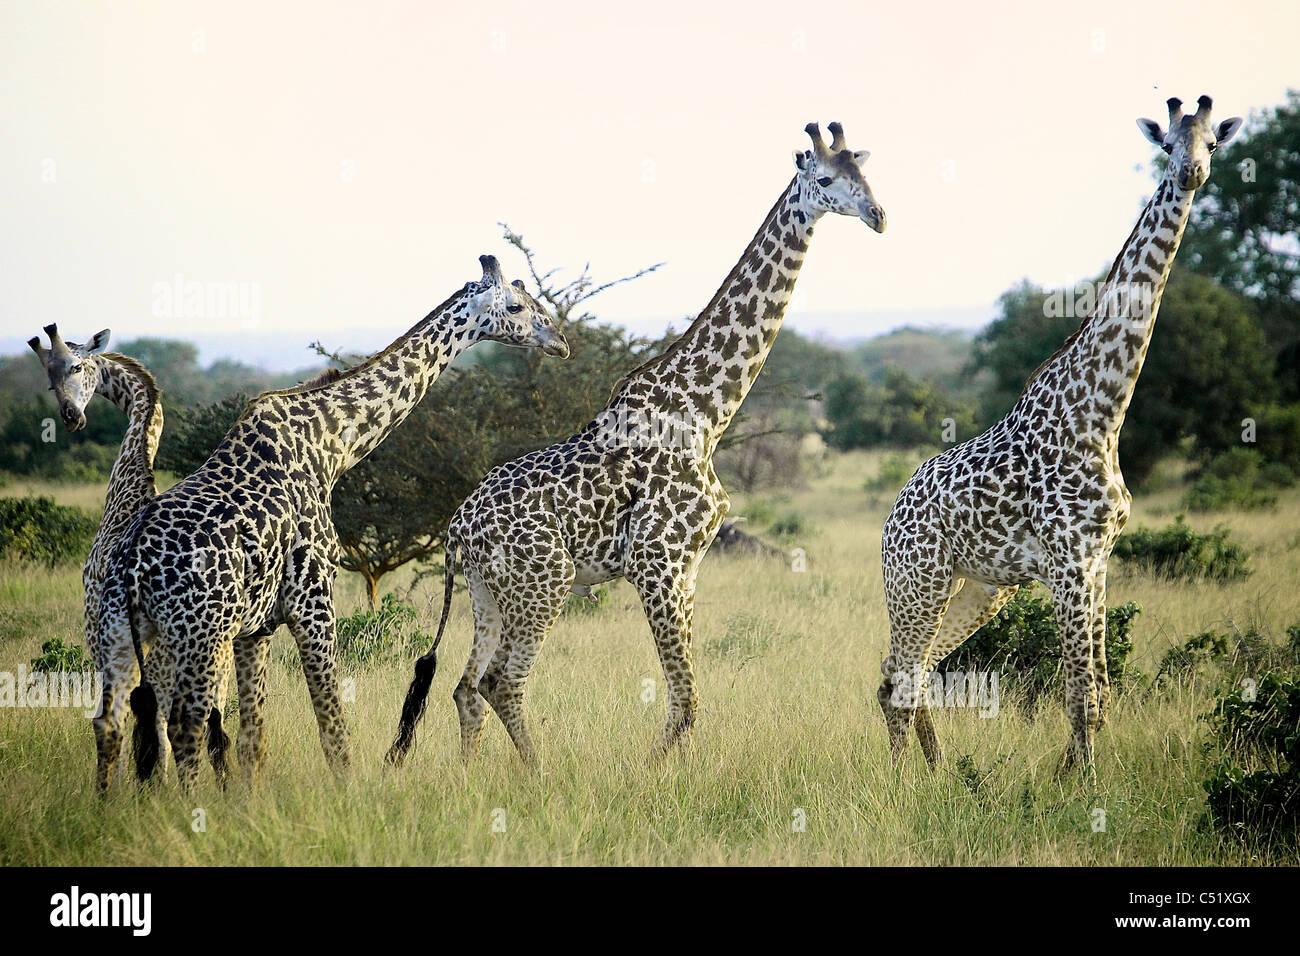 Girafe Giraffa camelopardalis Saadani Afrique Tanzanie Photo Stock